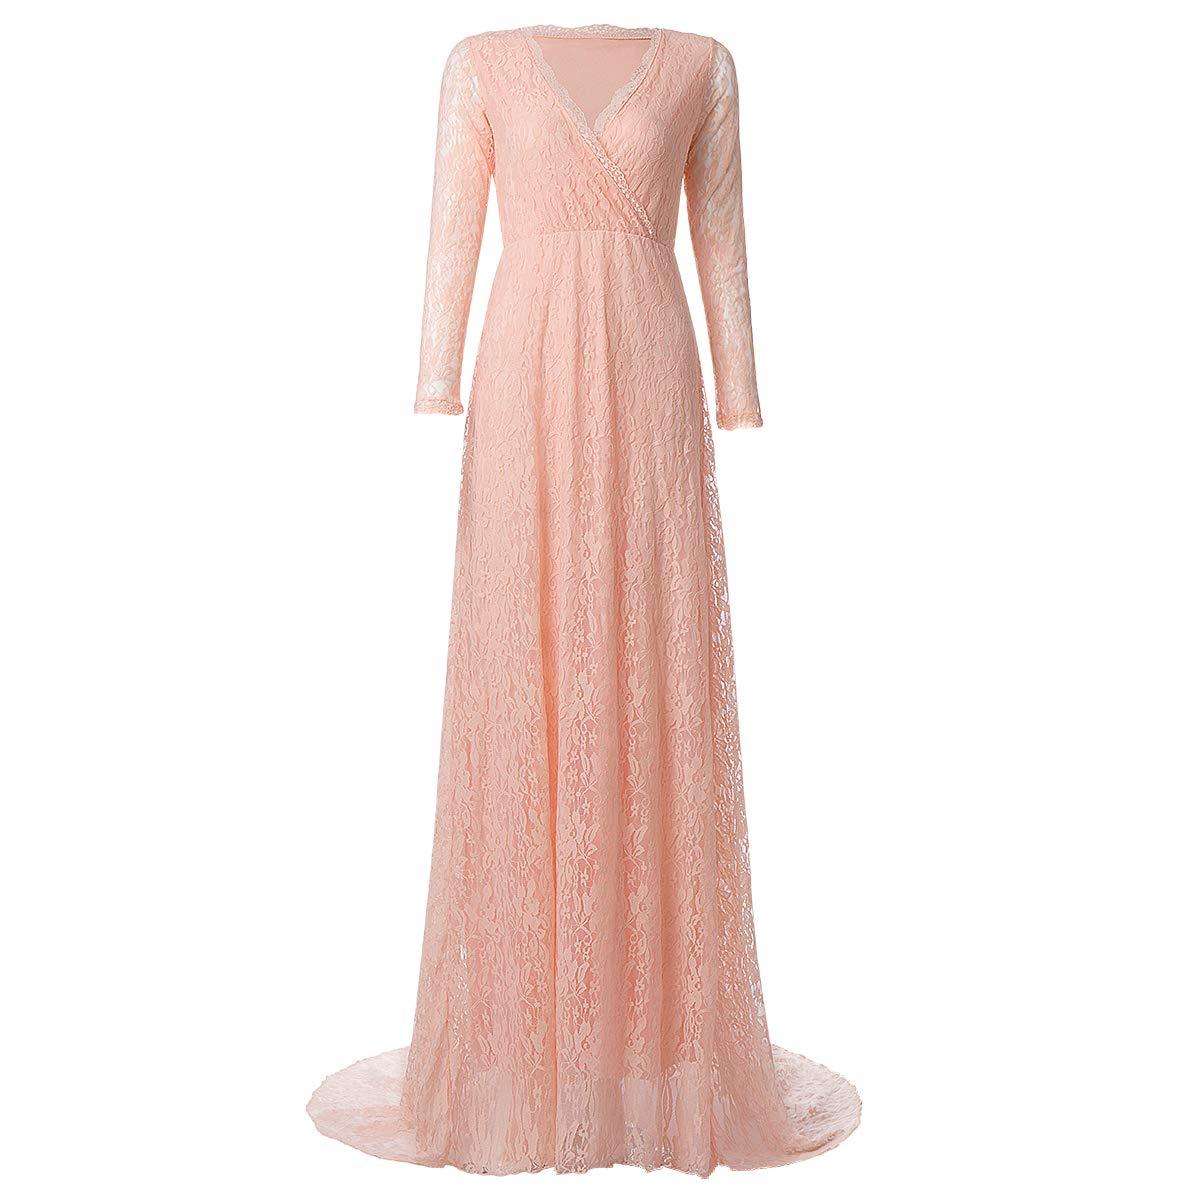 IBTOM CASTLE Women Long Maxi Gown V Neck Lace Bridesmaid Evening Dress